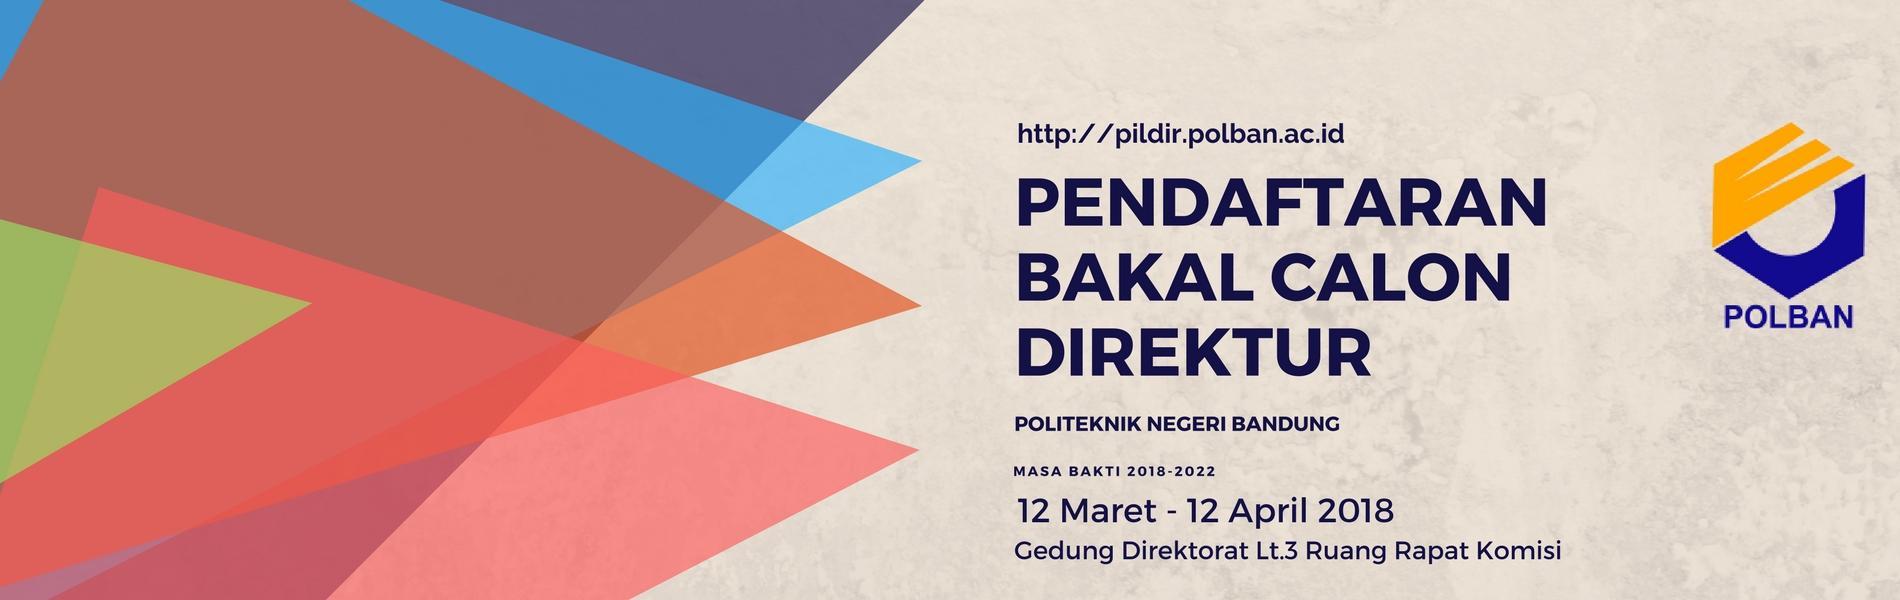 Pendaftaran Bakal Calon Direktur POLBAN Masa Bakti 2018-2022